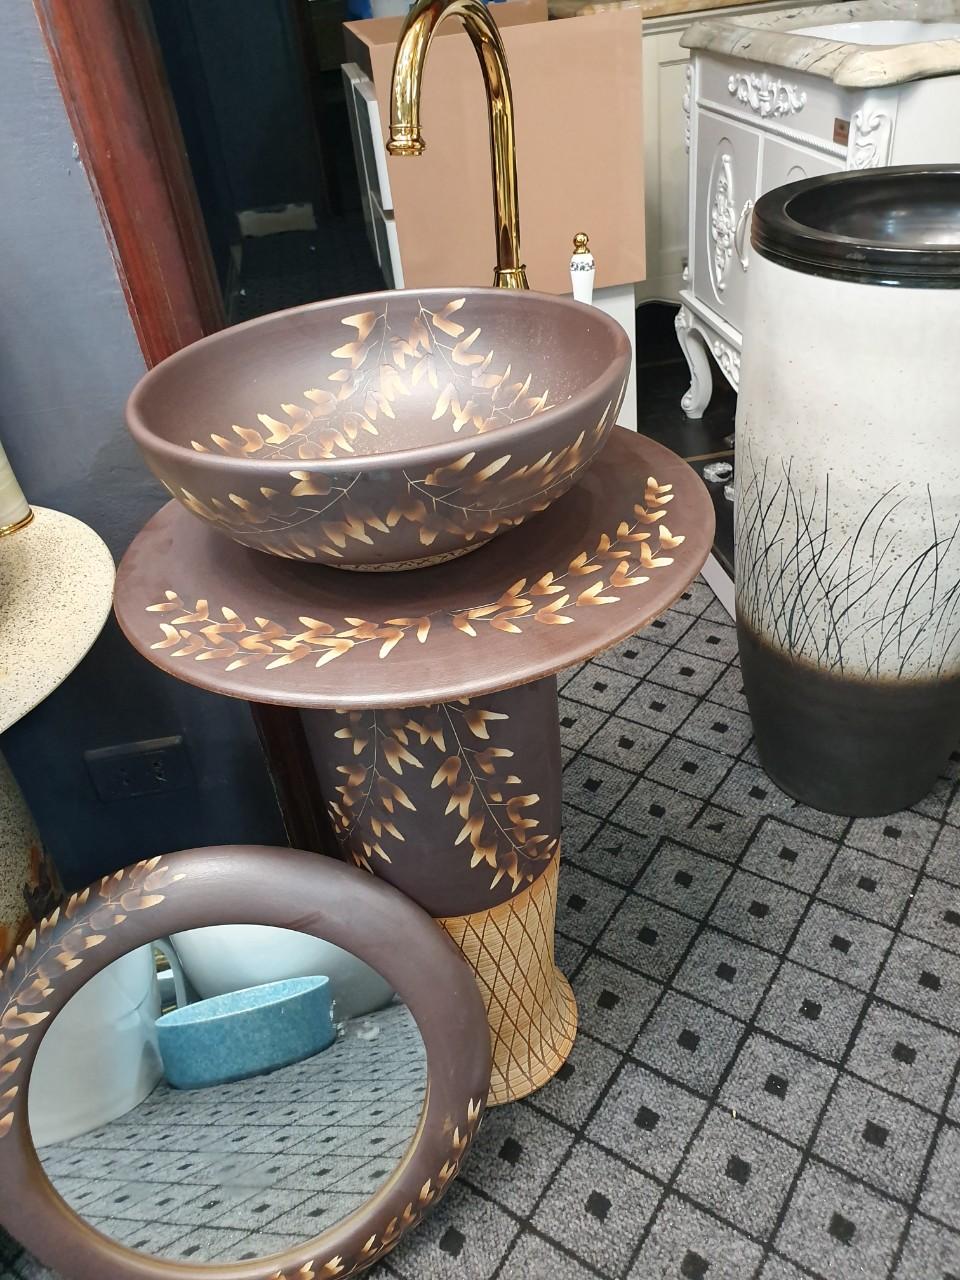 lavabo-dung-den-hoa-vien-nau